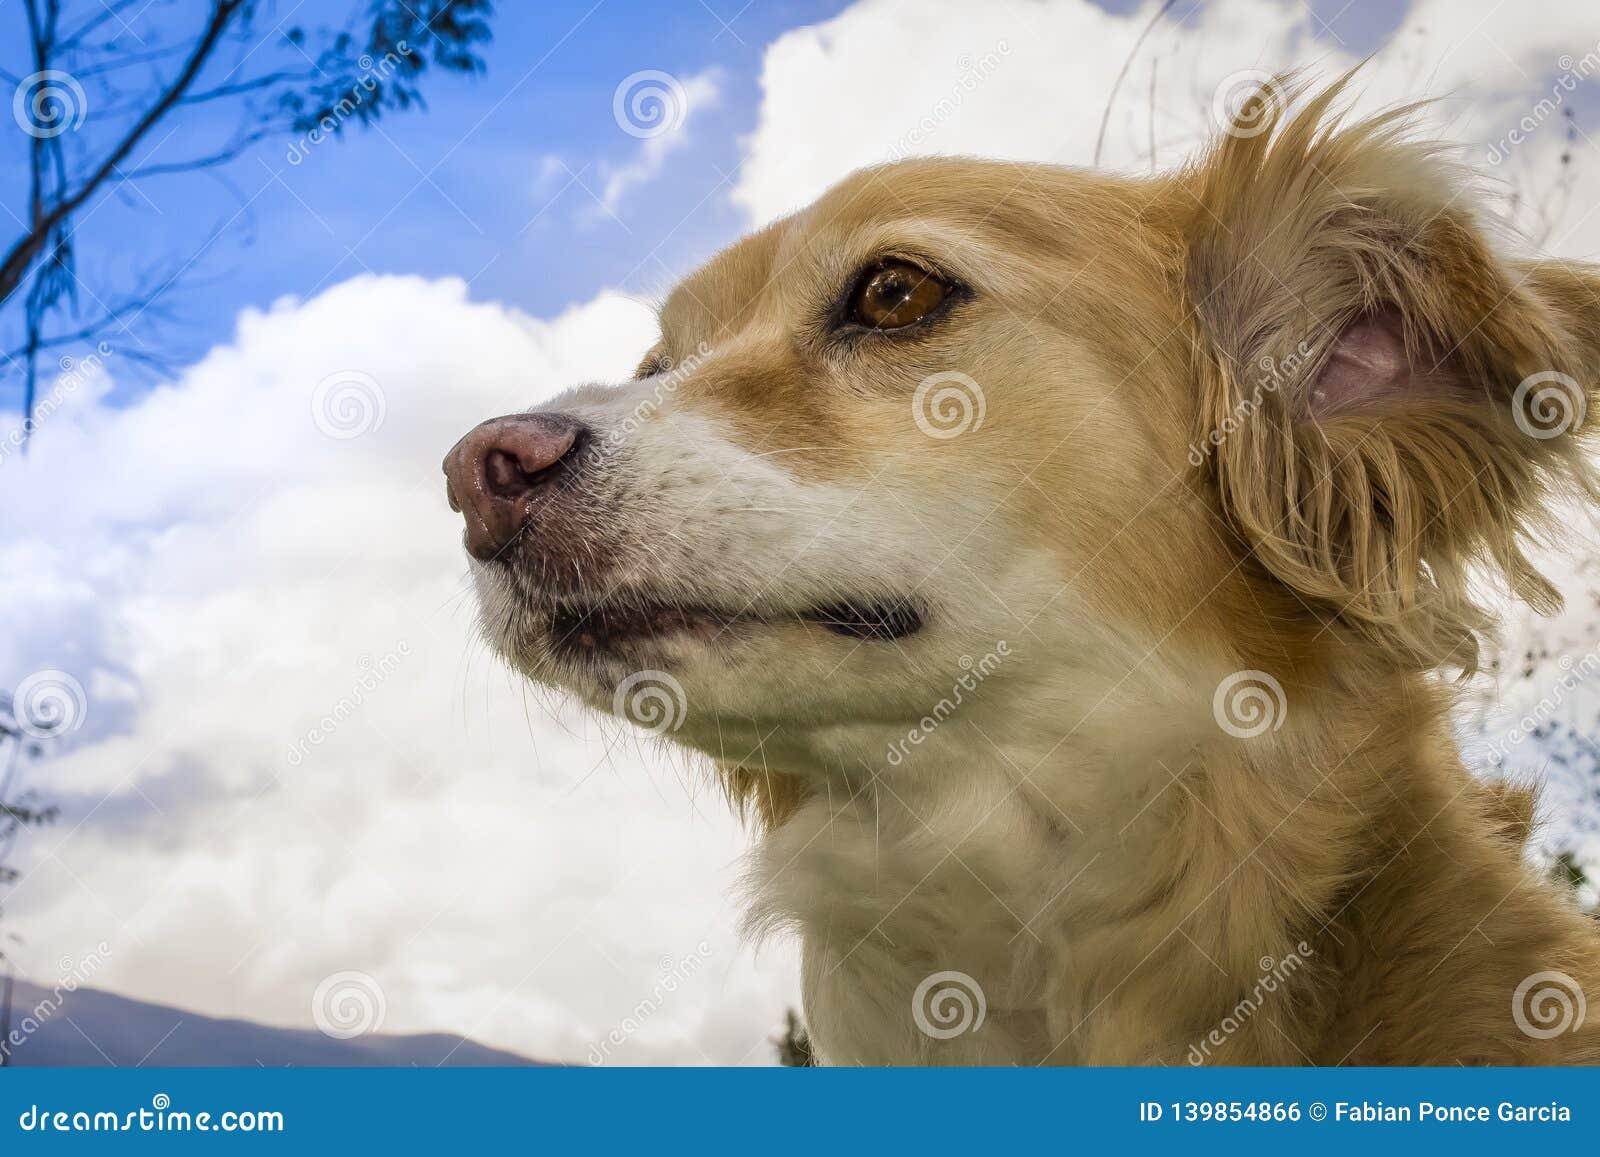 Beautiful mongrel dog yellow with white